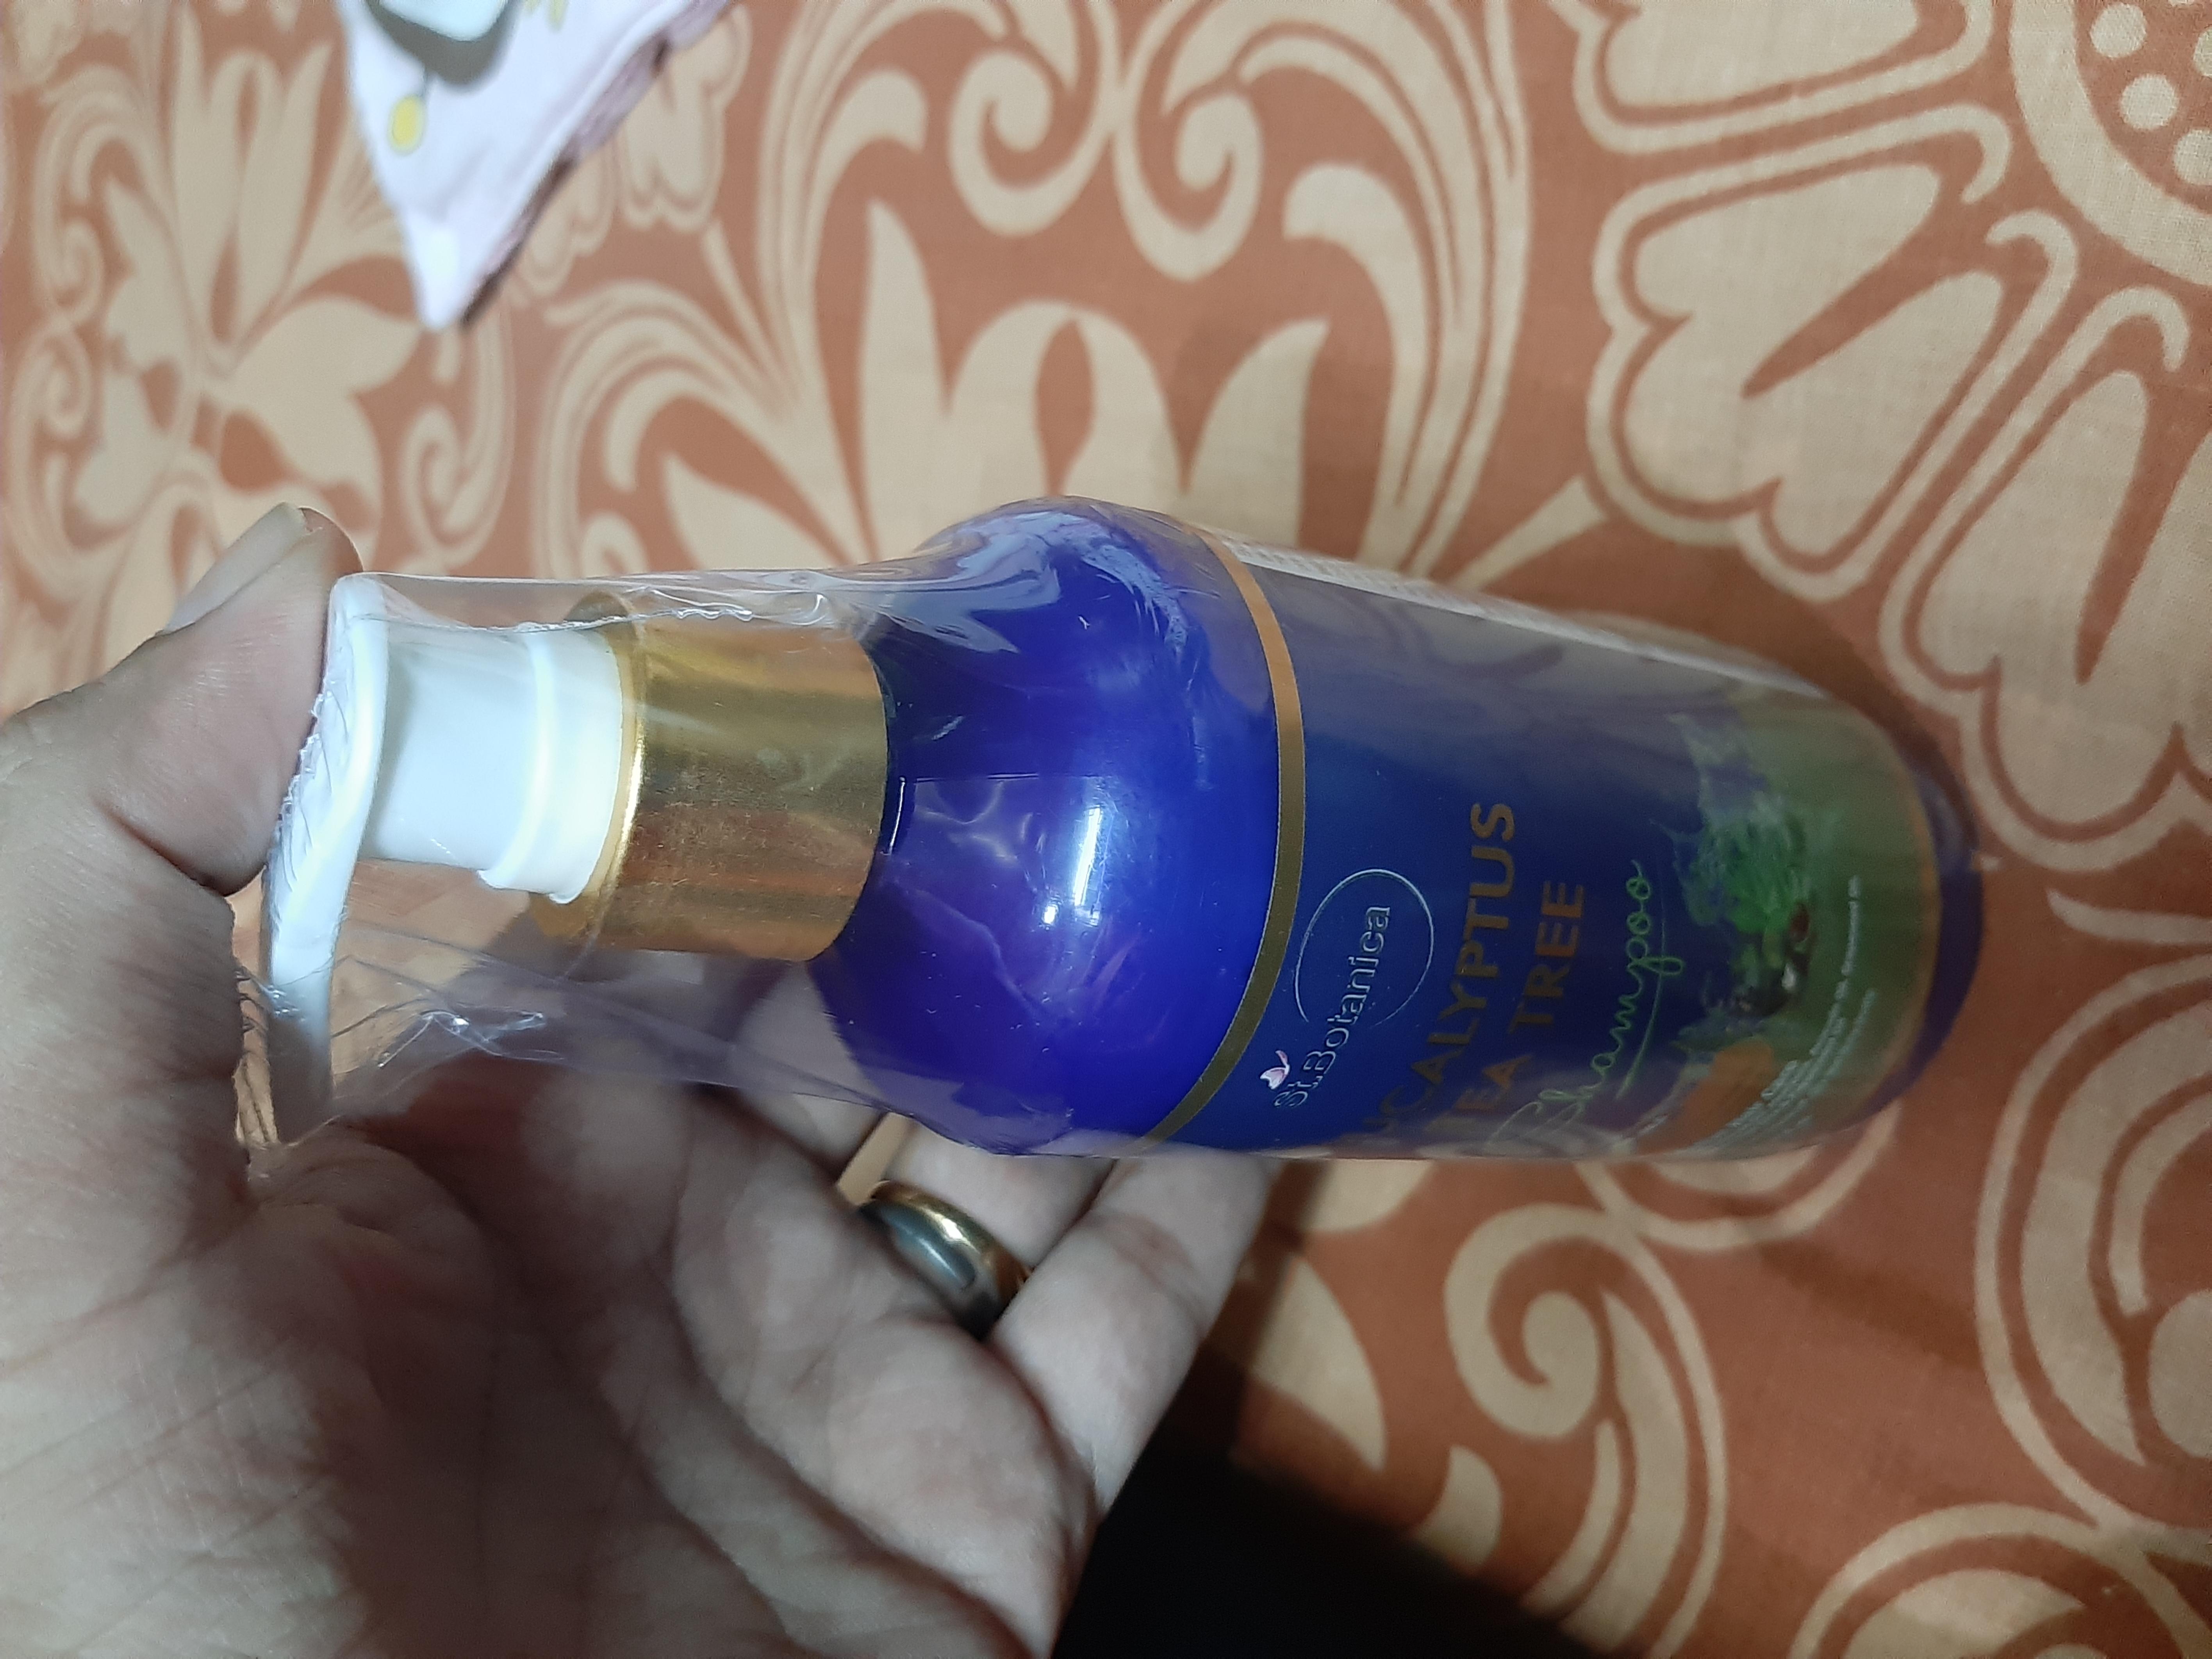 St.Botanica Eucalyptus & Tea Tree Dry Hair Repair Shampoo pic 2-Best as described-By sonalig7